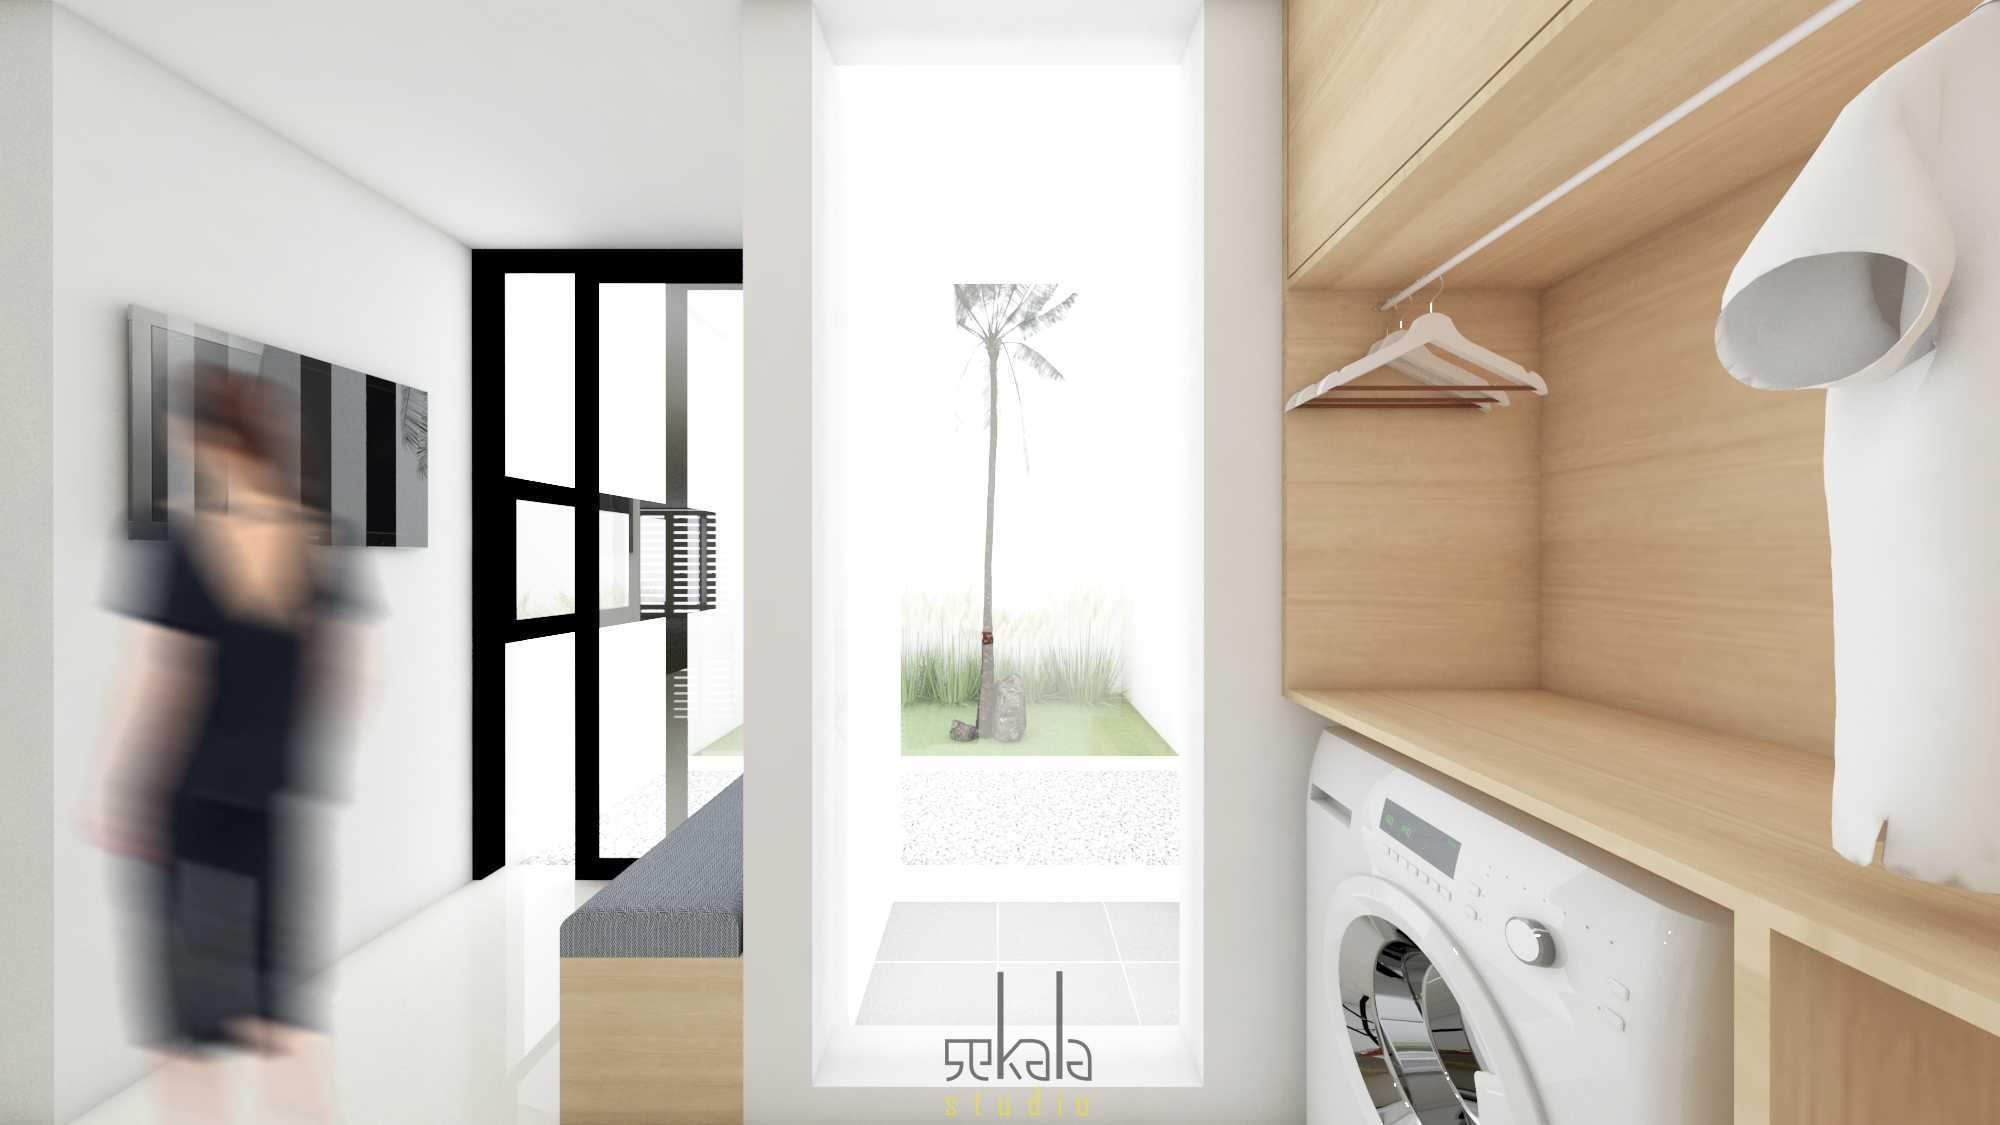 Foto inspirasi ide desain laundry Sekala-rumah-keputih oleh SEKALA di Arsitag